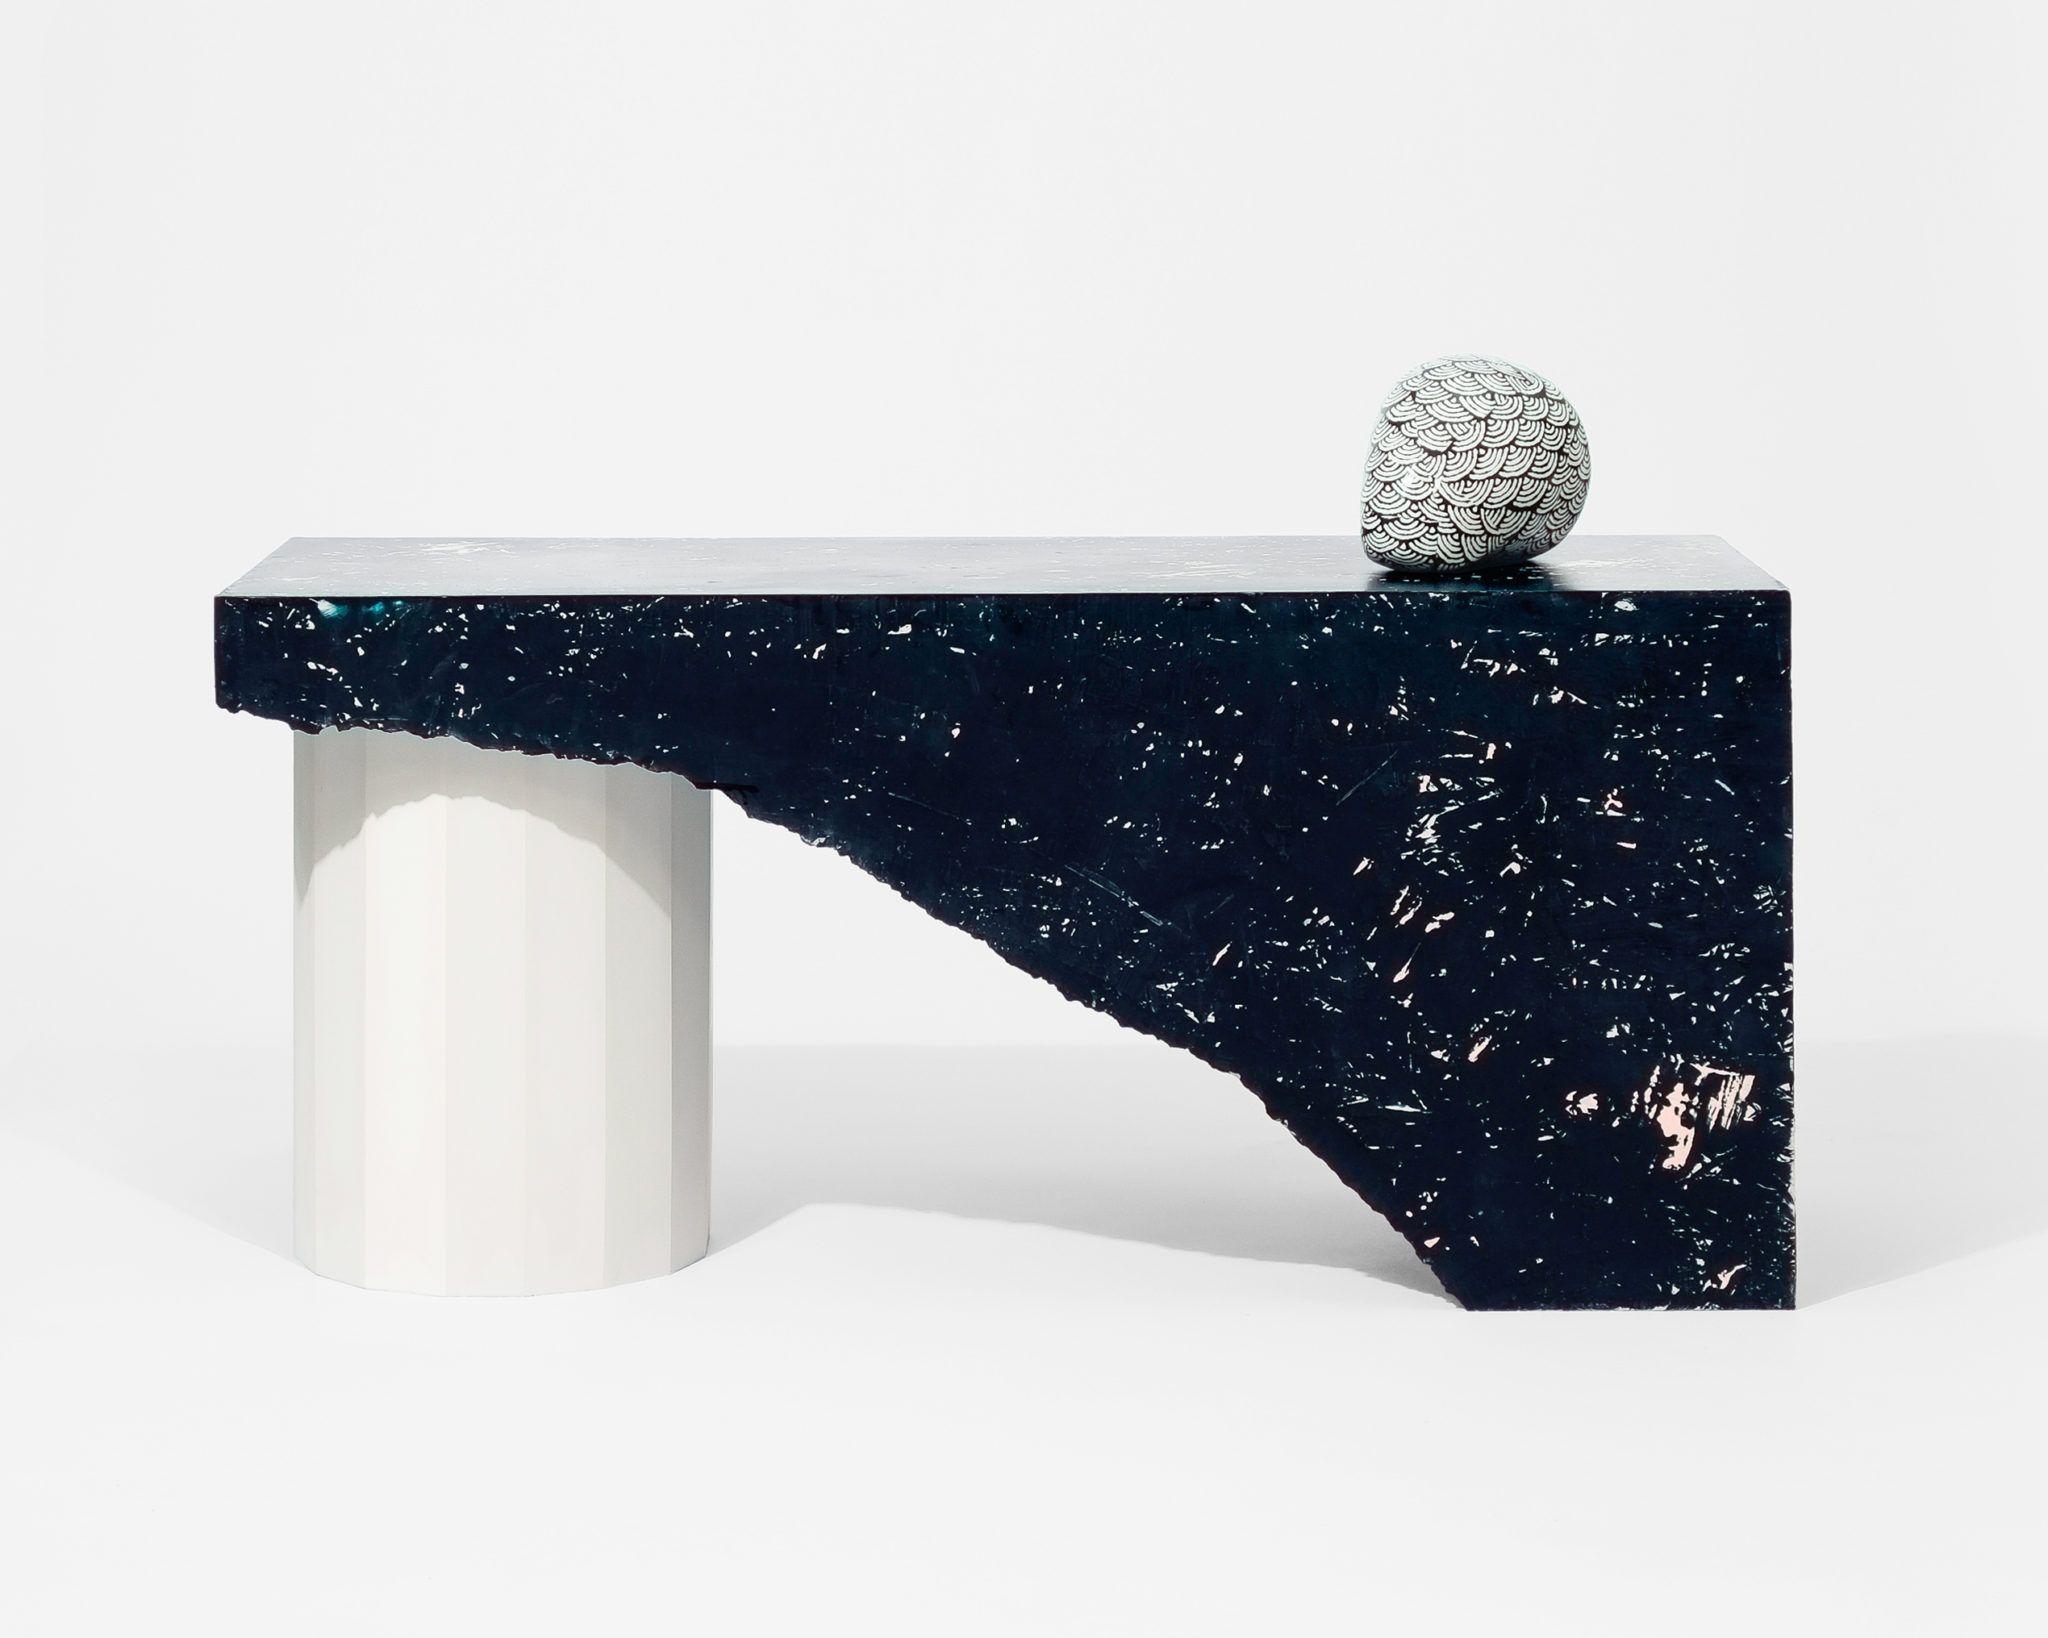 Design Andreason Leibel Le Parfait Equilibre Des Formes Huskdesignblog Tendance Deco Design Objet Deco